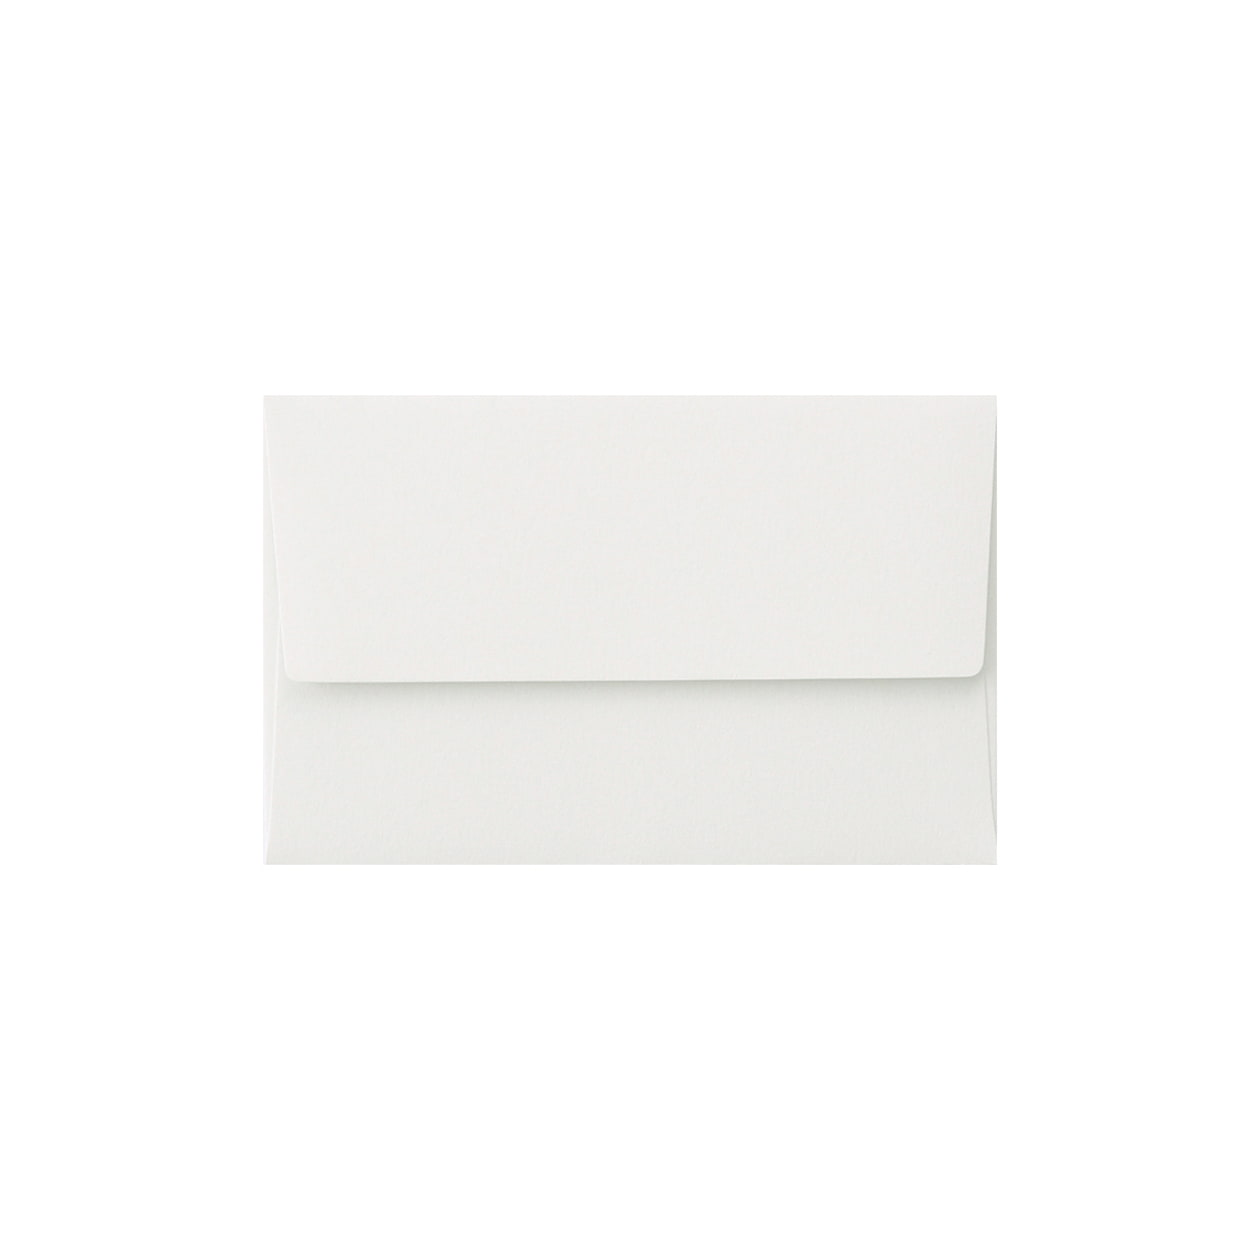 NEカマス封筒 コットン ライトグレイ 116.3g